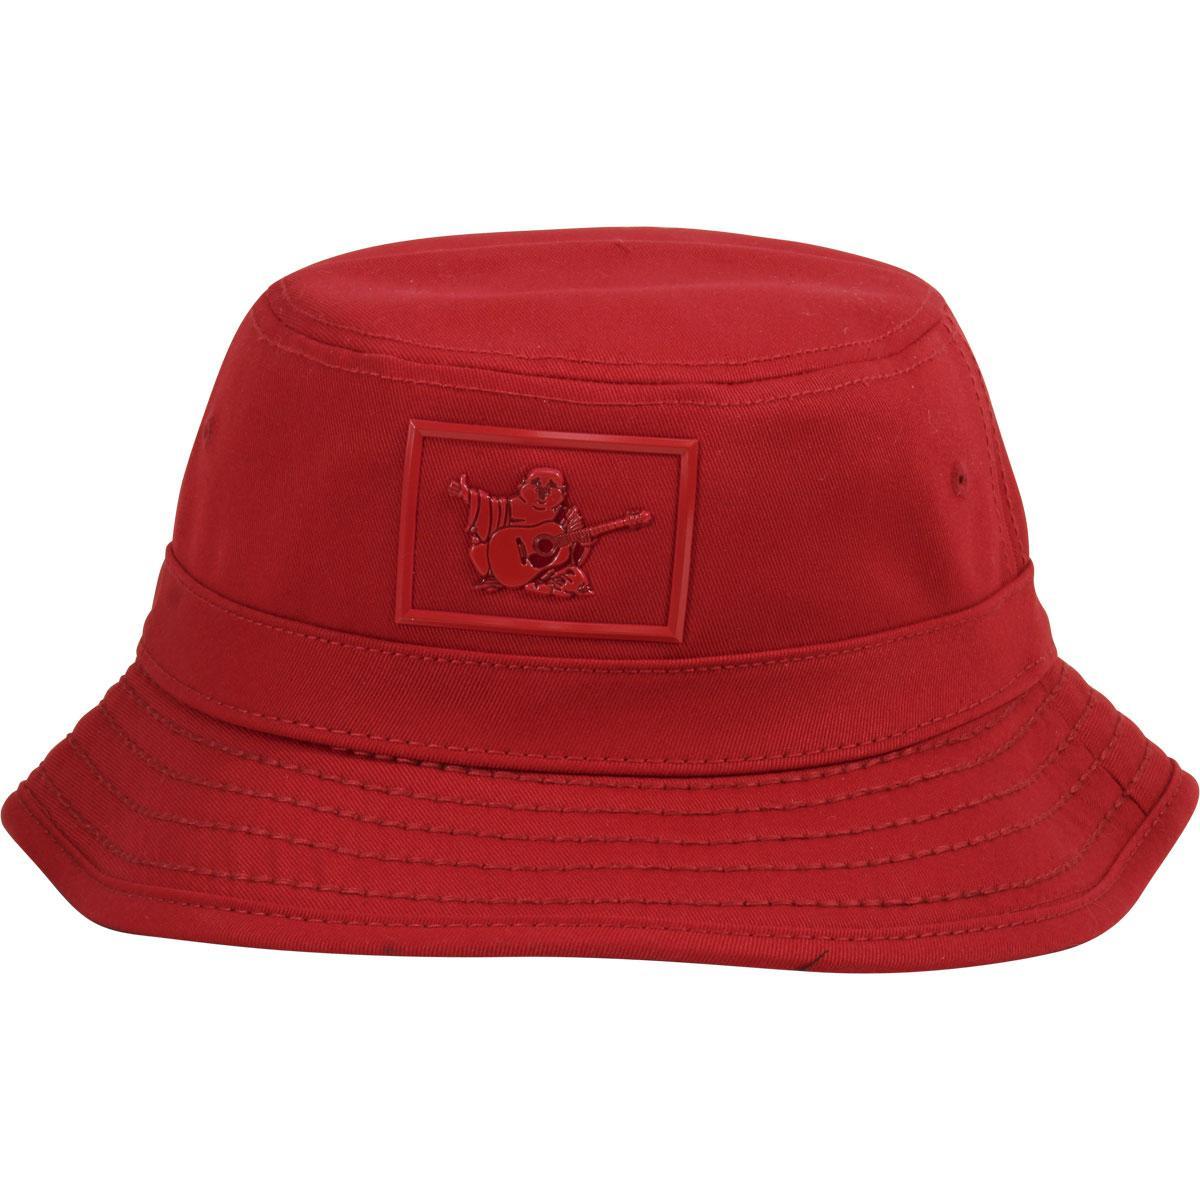 e8a010bb1cdbd True Religion Men s Shiny Buddha Cotton Bucket Hat